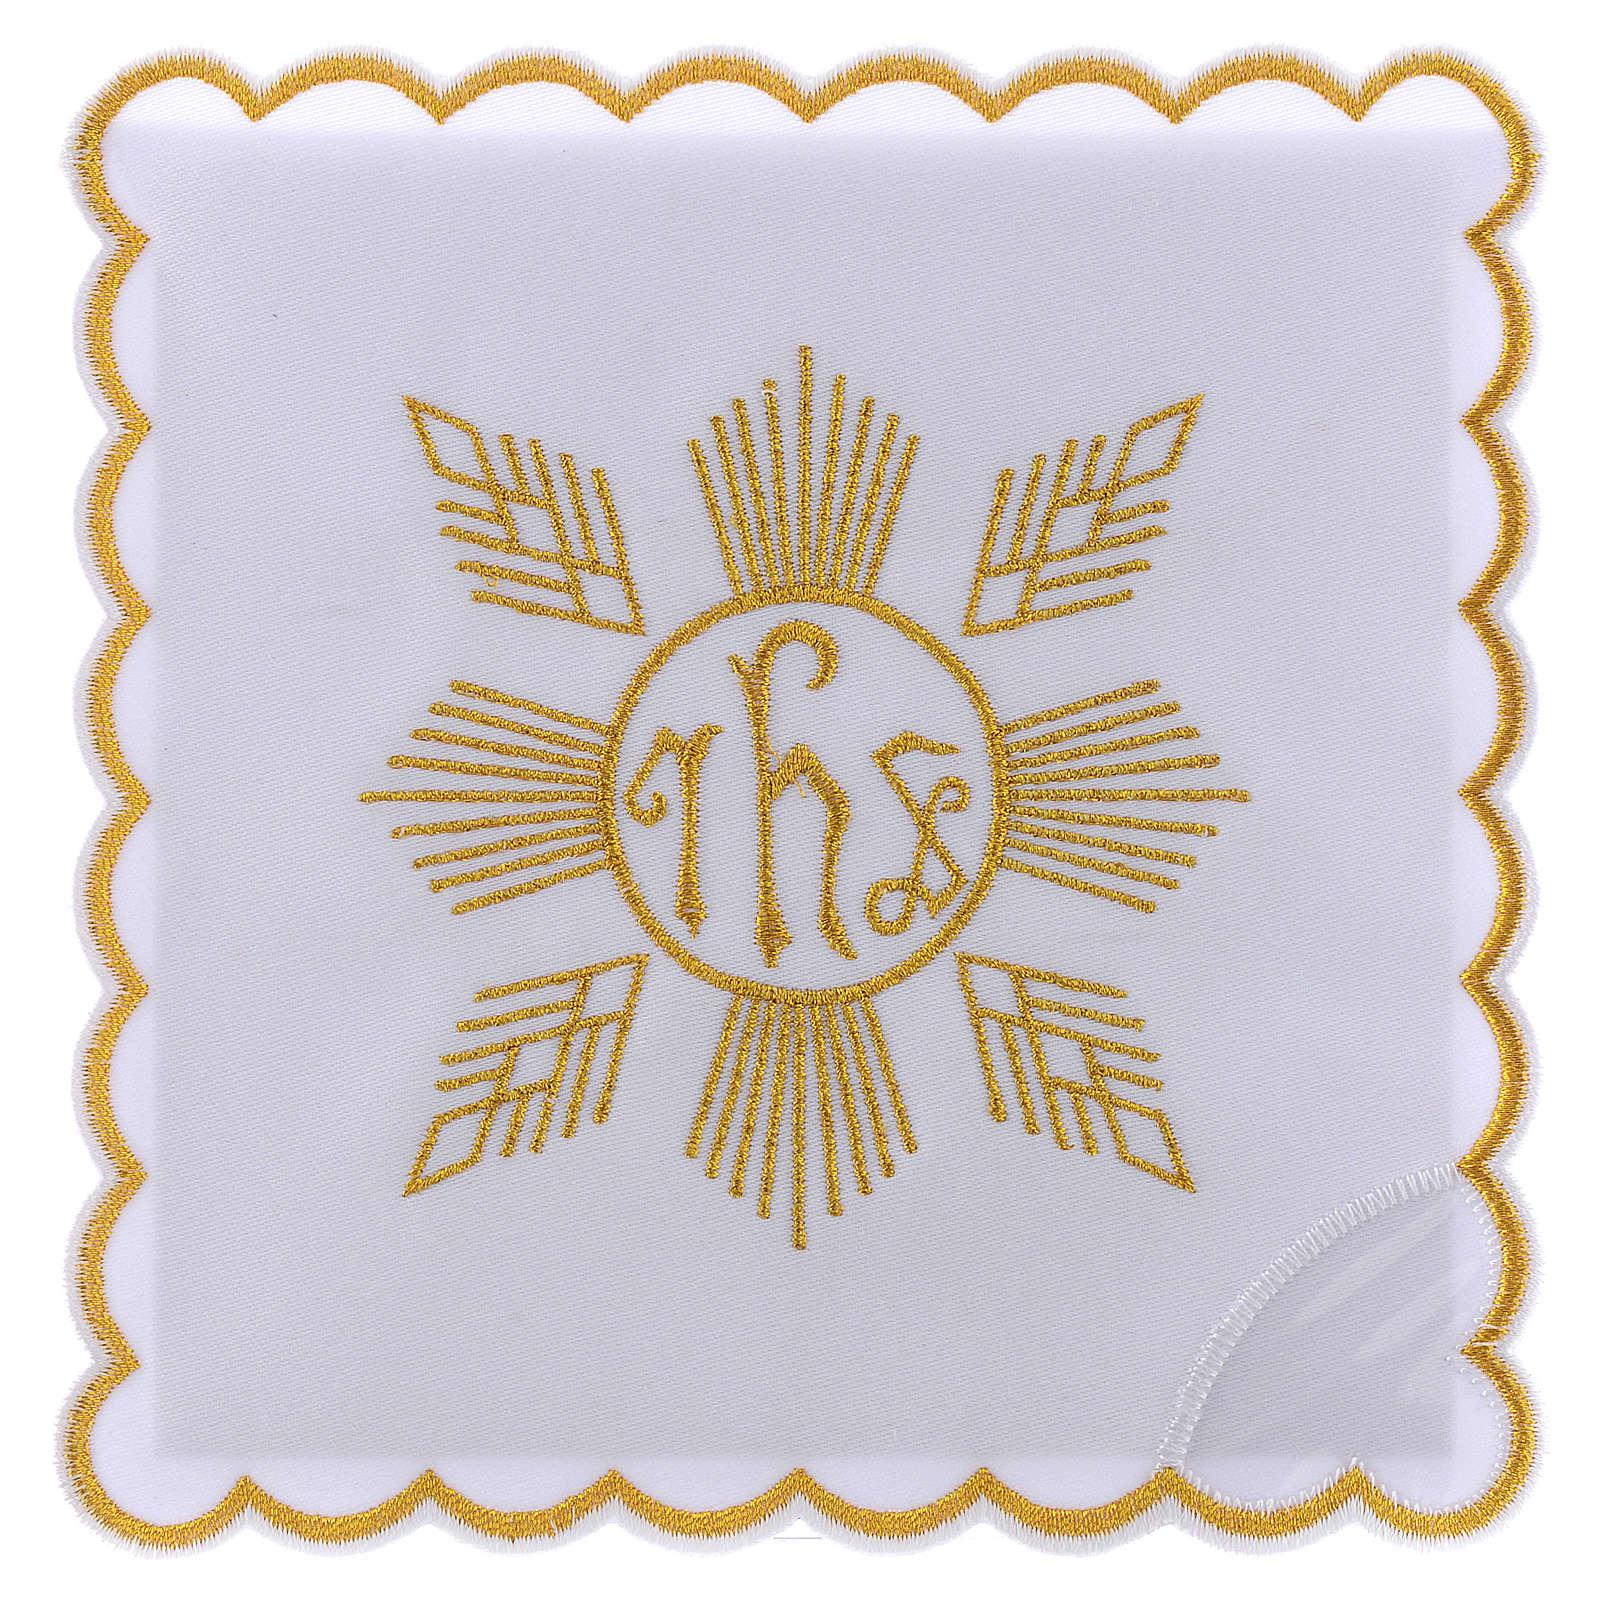 Altar linen golden embroideries geometrical figures & JHS symbol, cotton 4